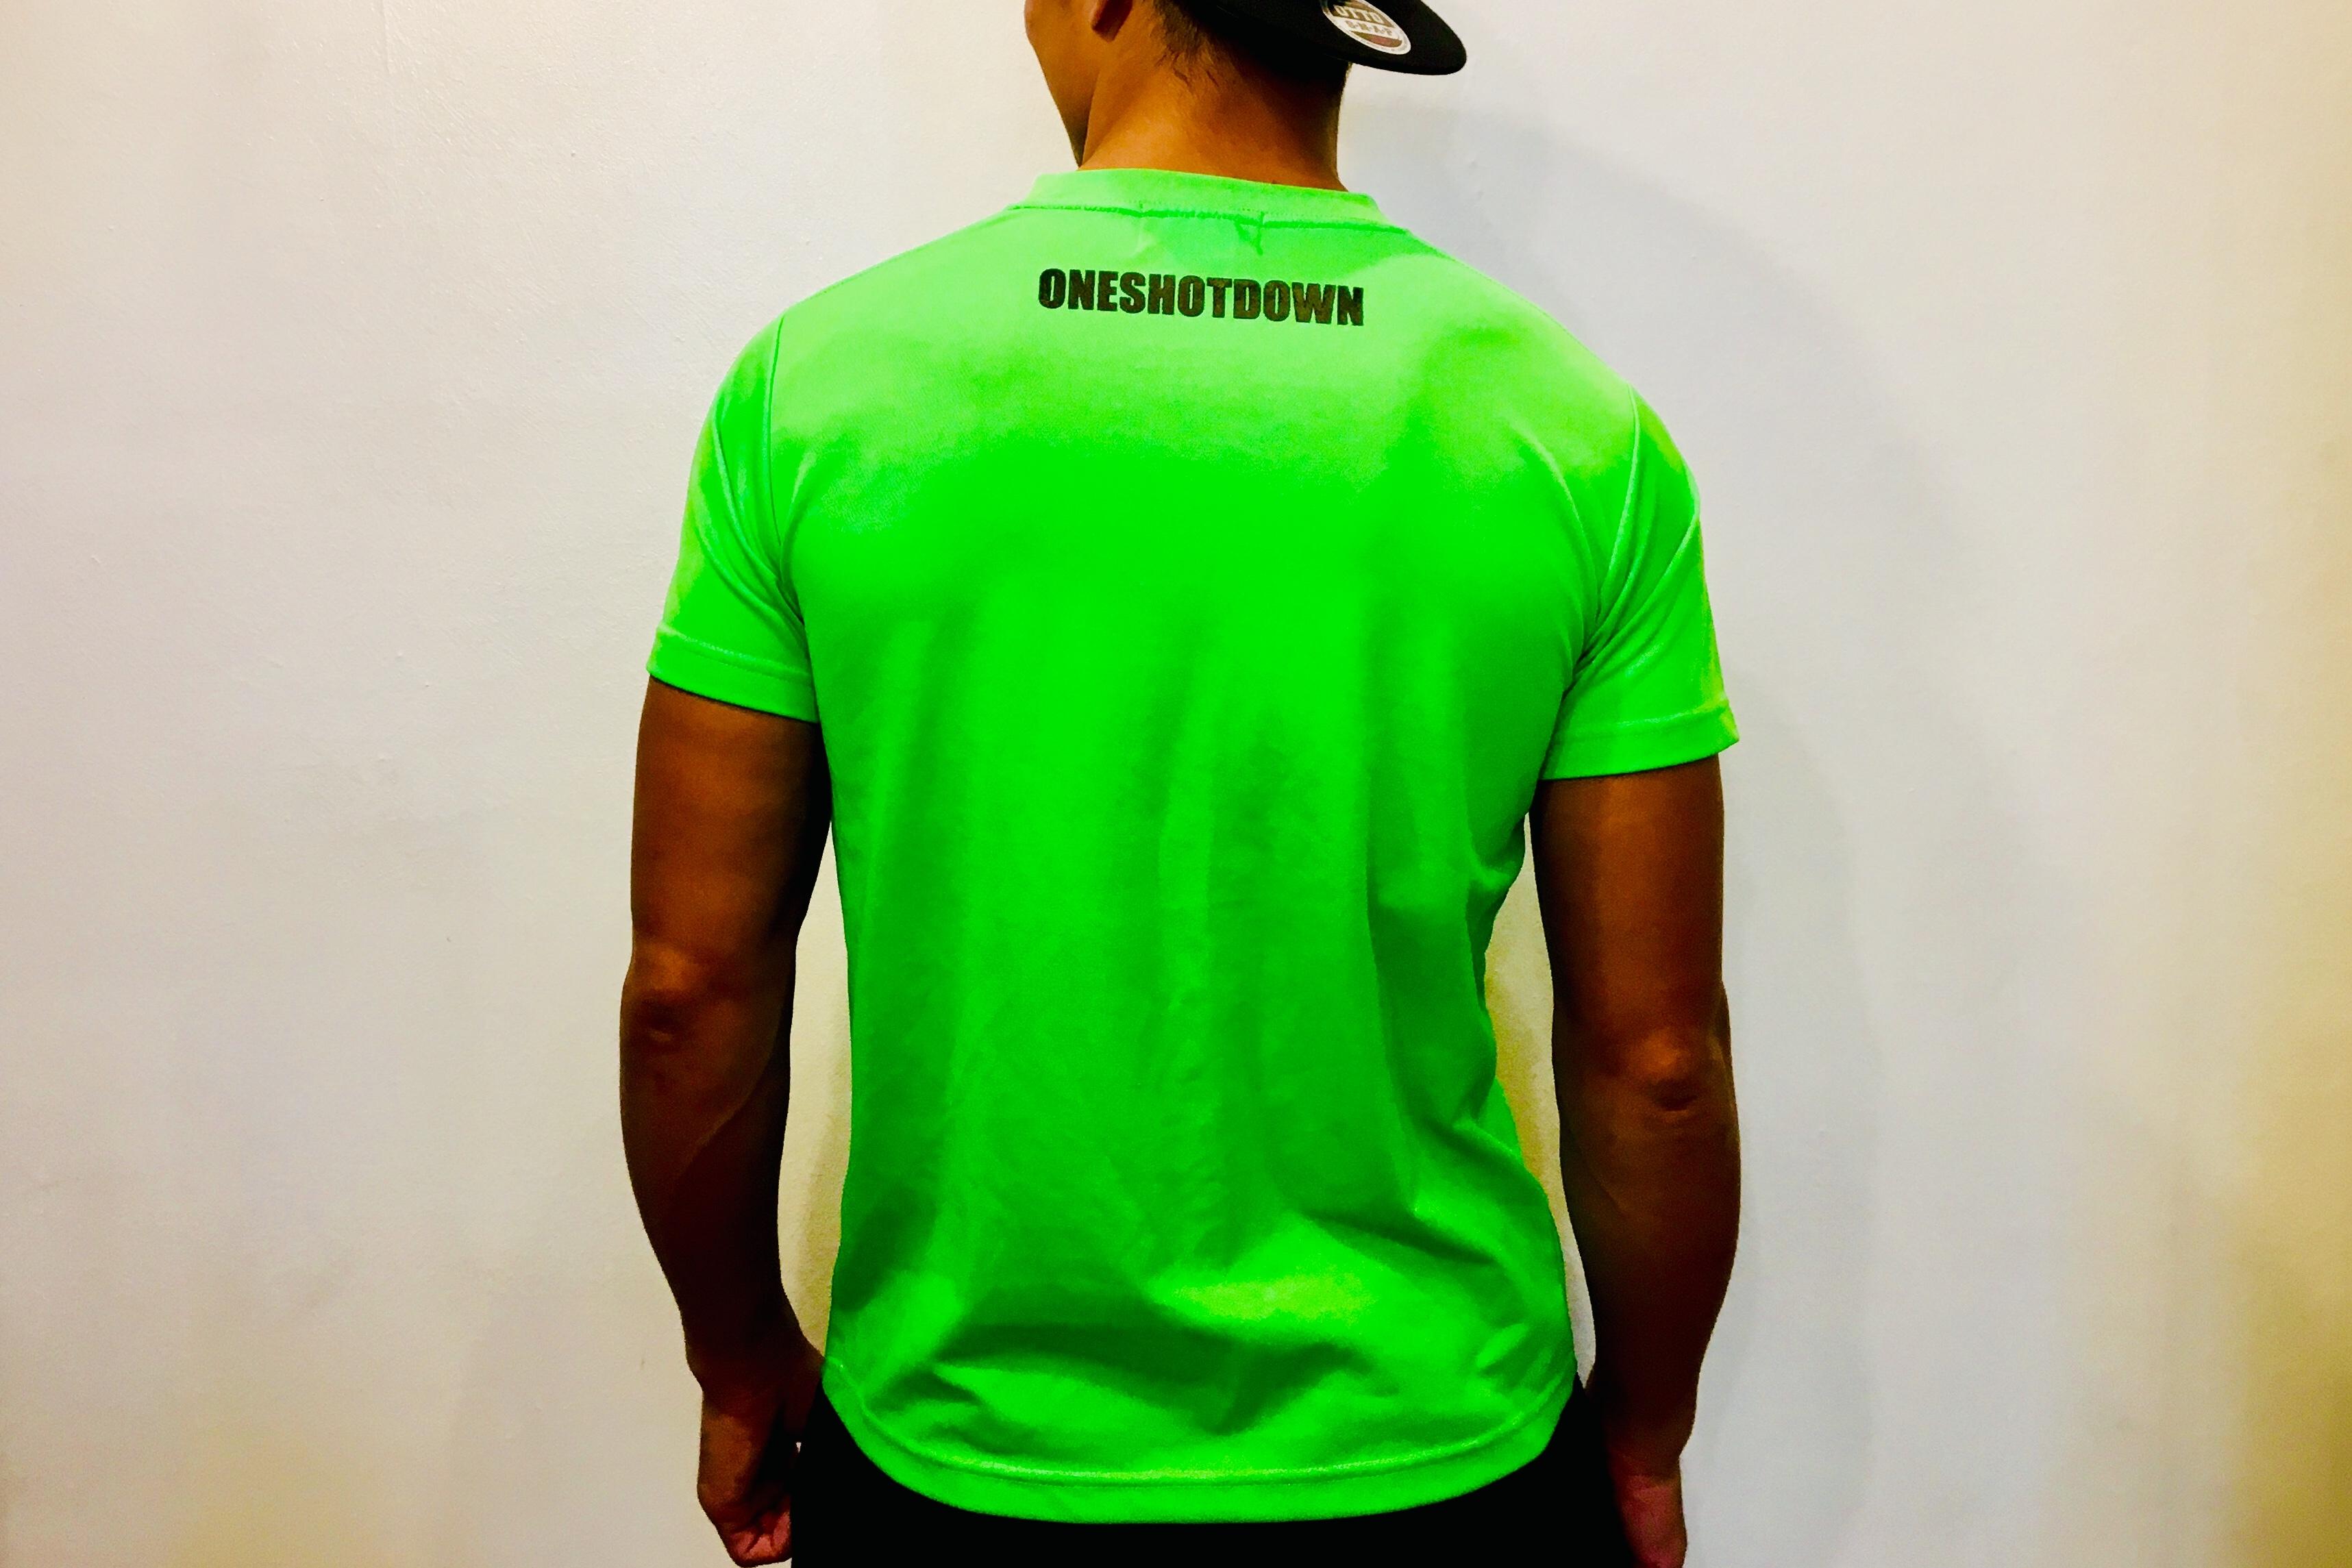 ONESHOTDOWN ネオンカラードライTシャツ - 画像5